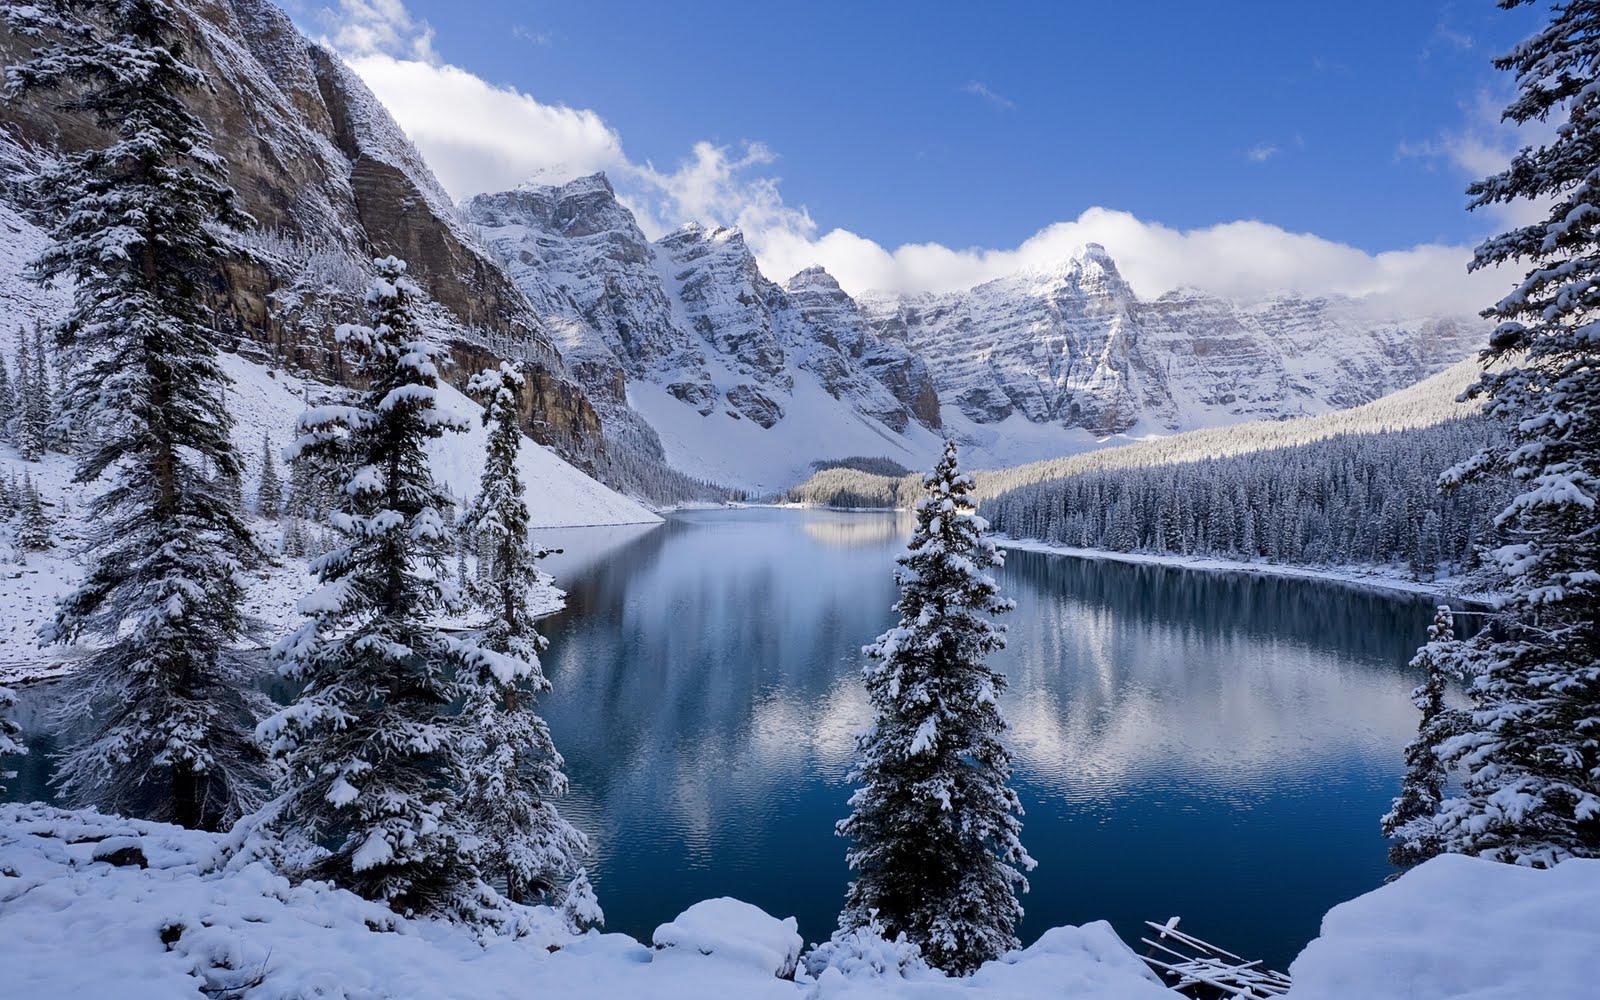 http://1.bp.blogspot.com/_W1ueYt1O3xs/TQqD48o7dKI/AAAAAAAAXbA/X7cKETHur6M/d/Winter+Landscape+Wallpapers+%25283%2529.jpg